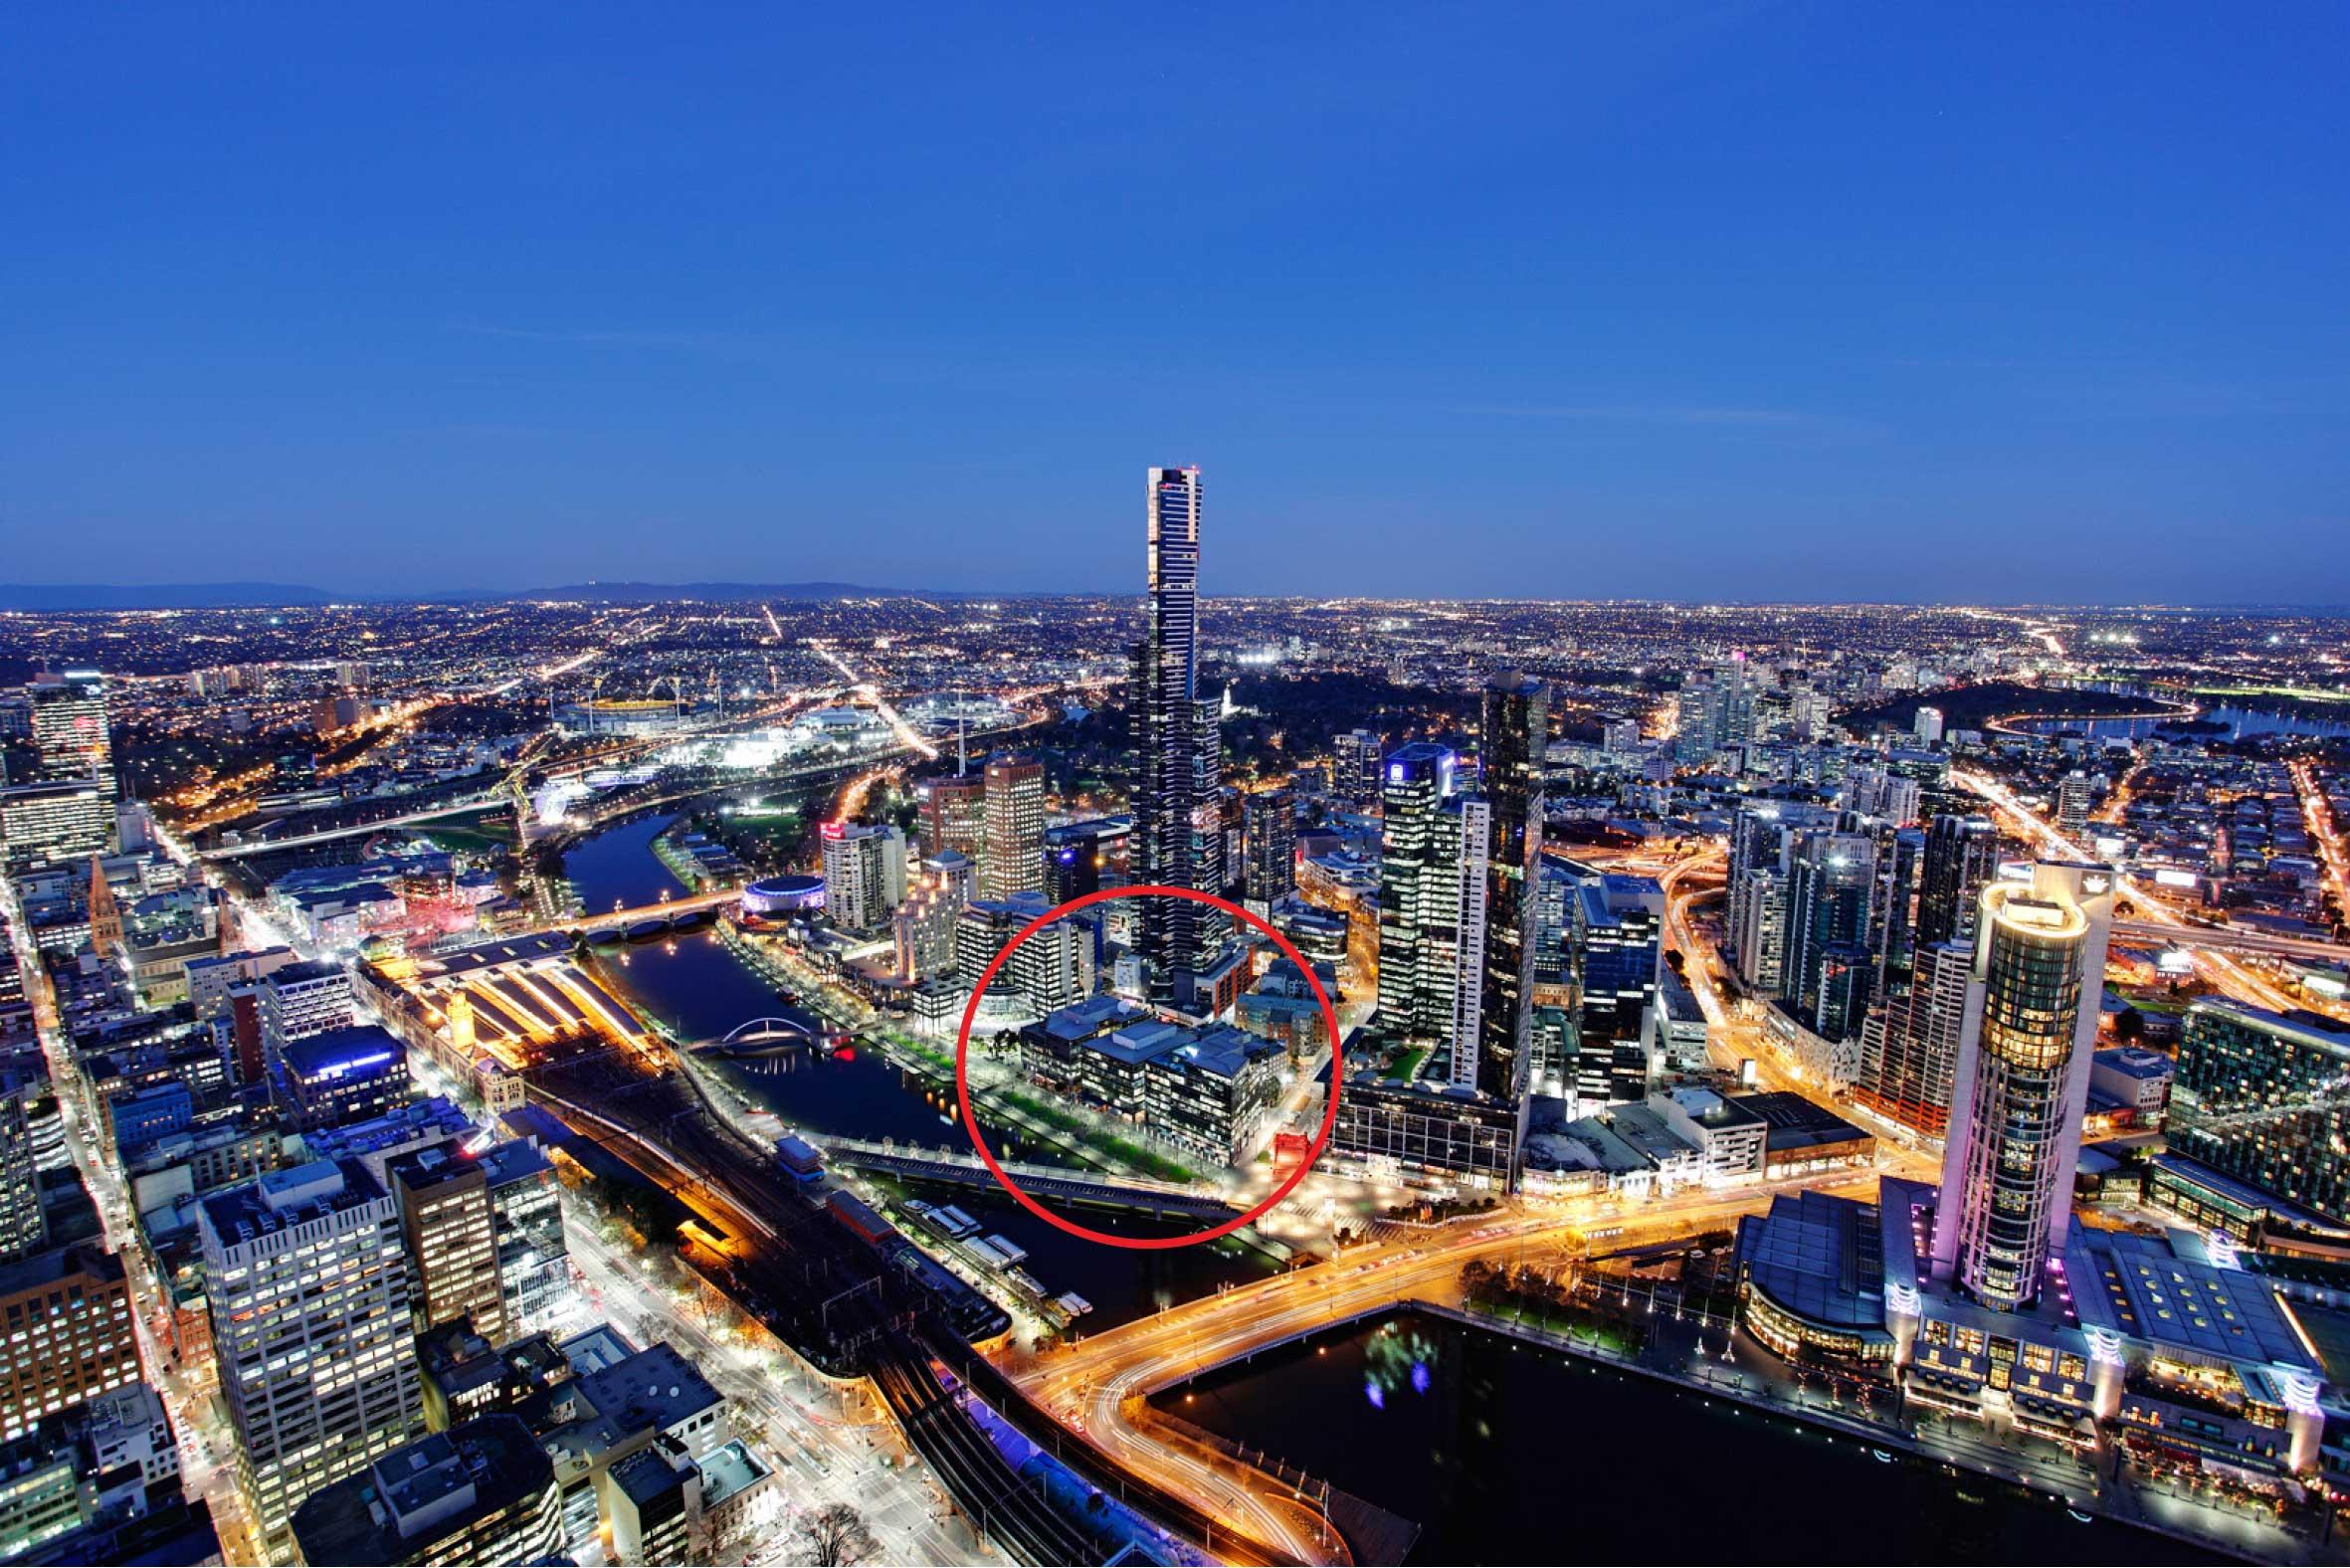 Riverside-Quay_Aerial.jpg